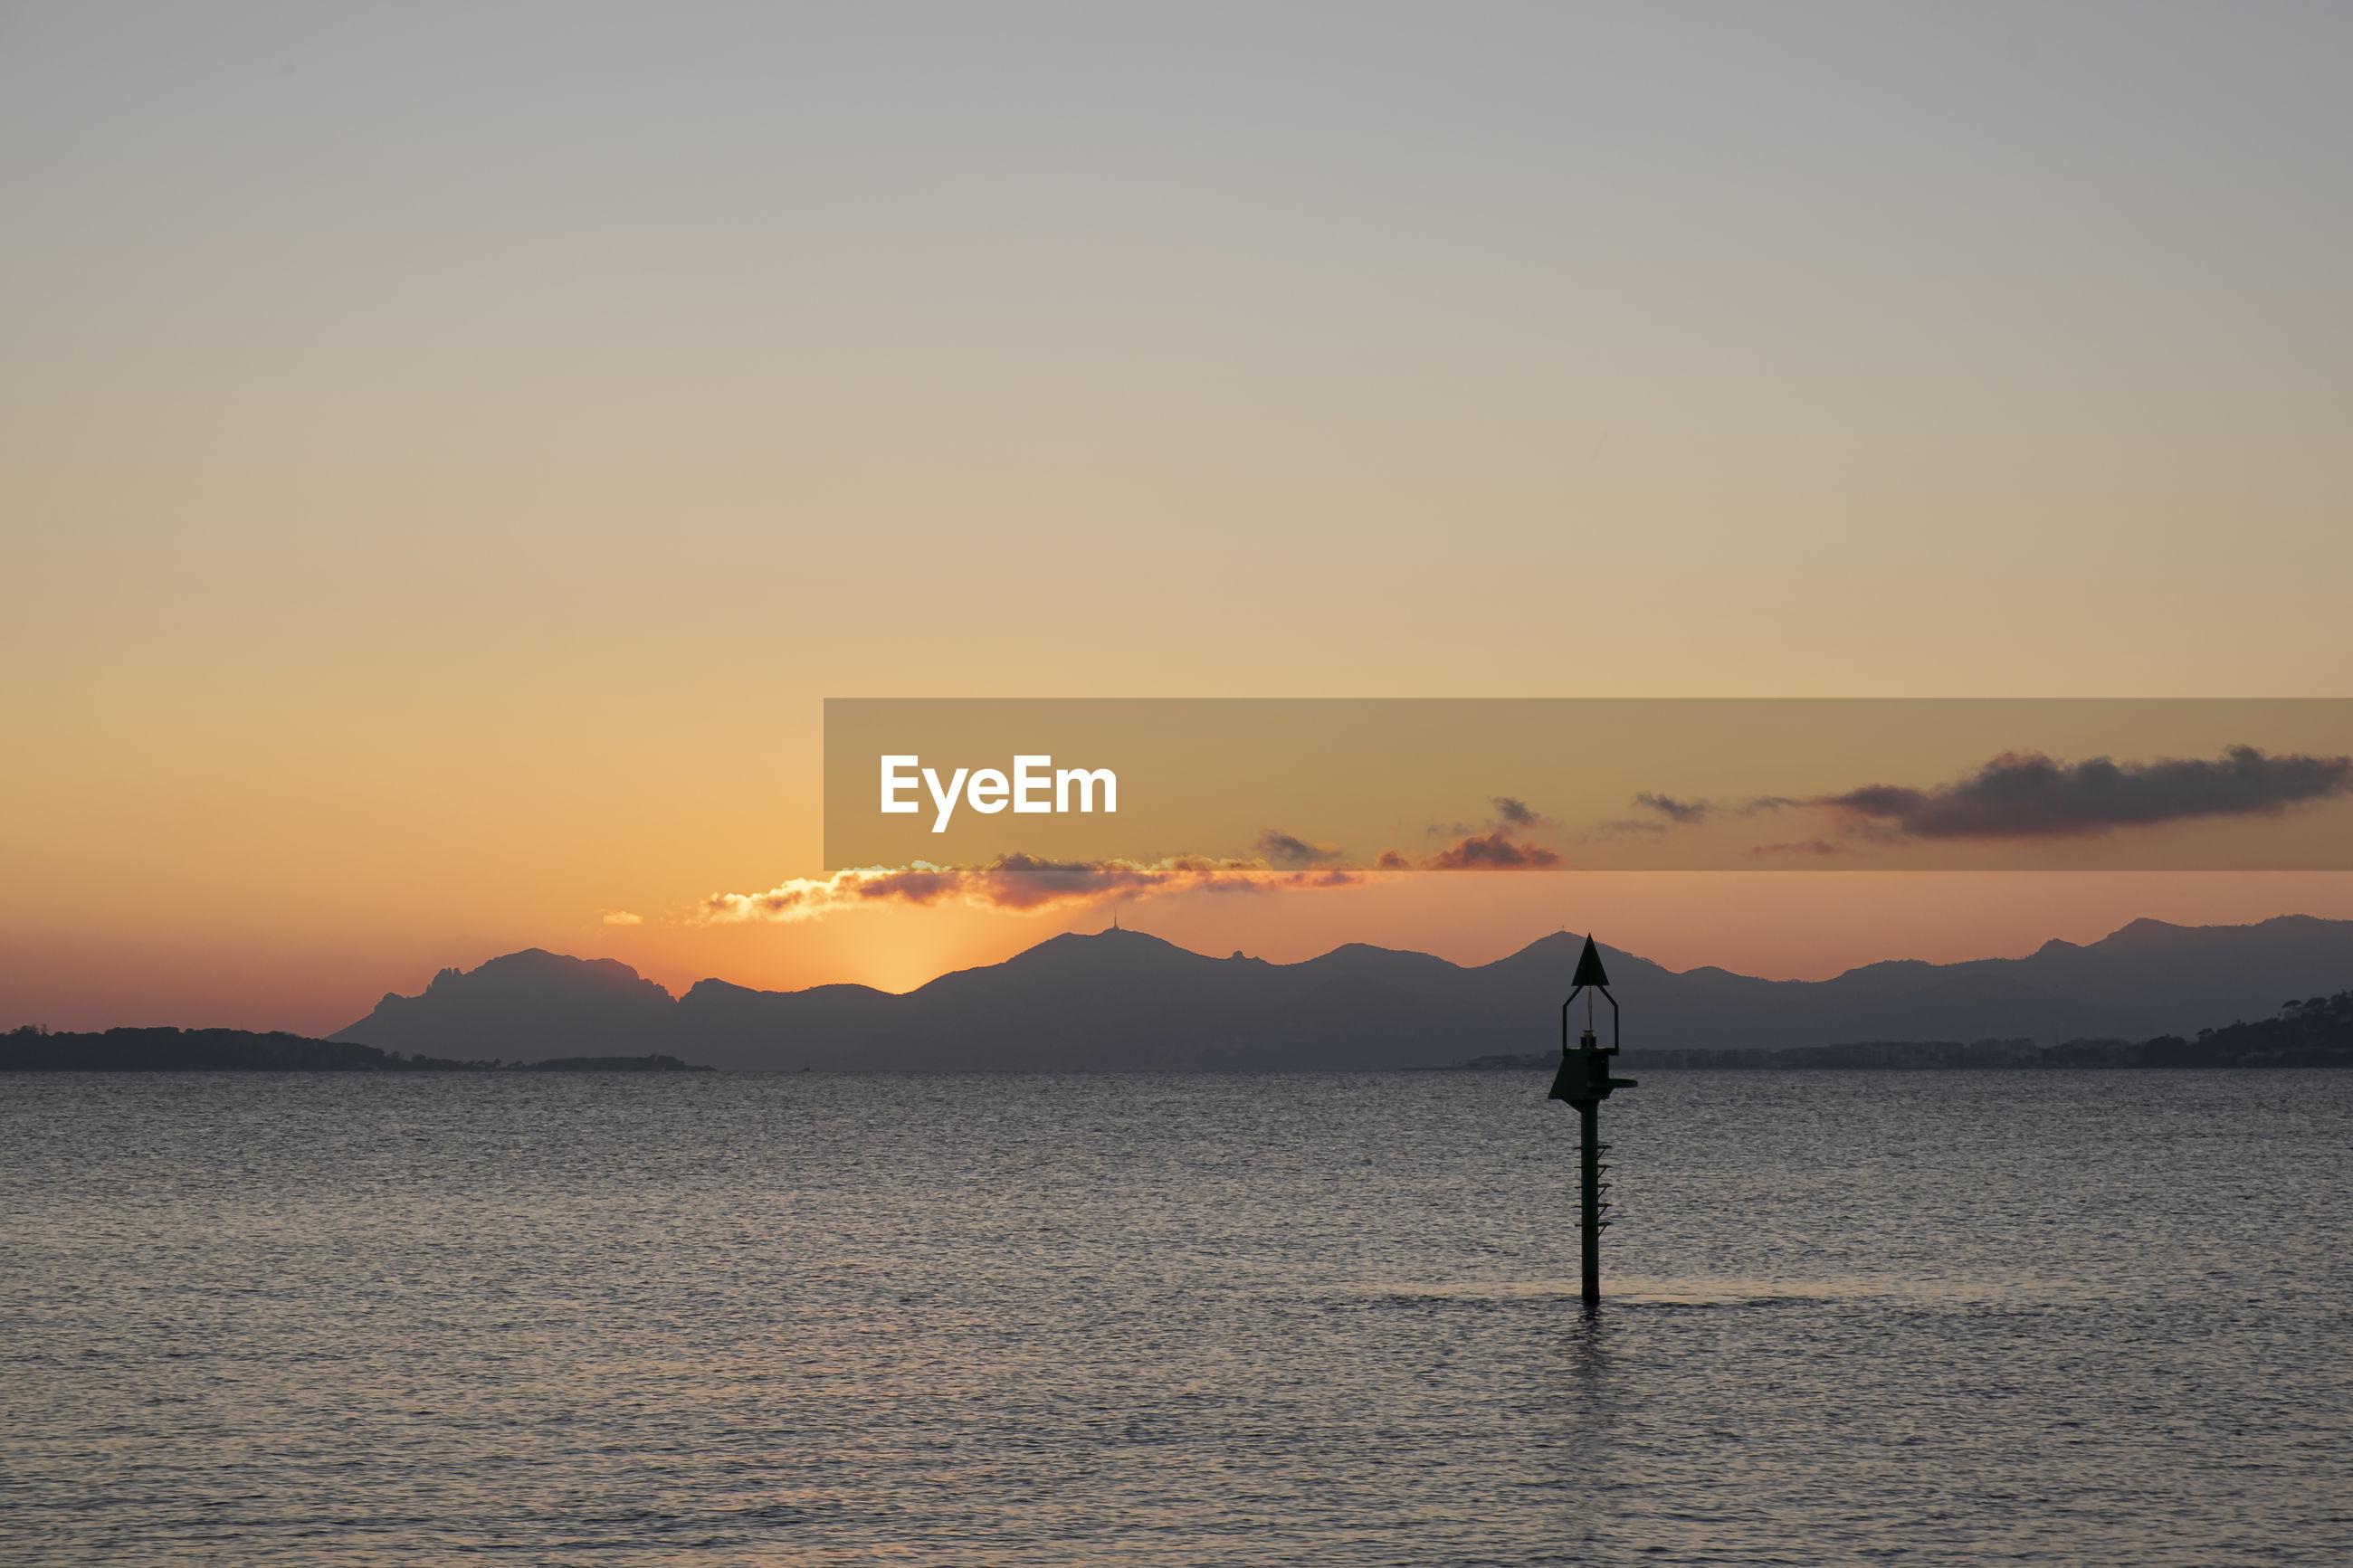 SILHOUETTE PERSON STANDING IN SEA AGAINST ORANGE SKY